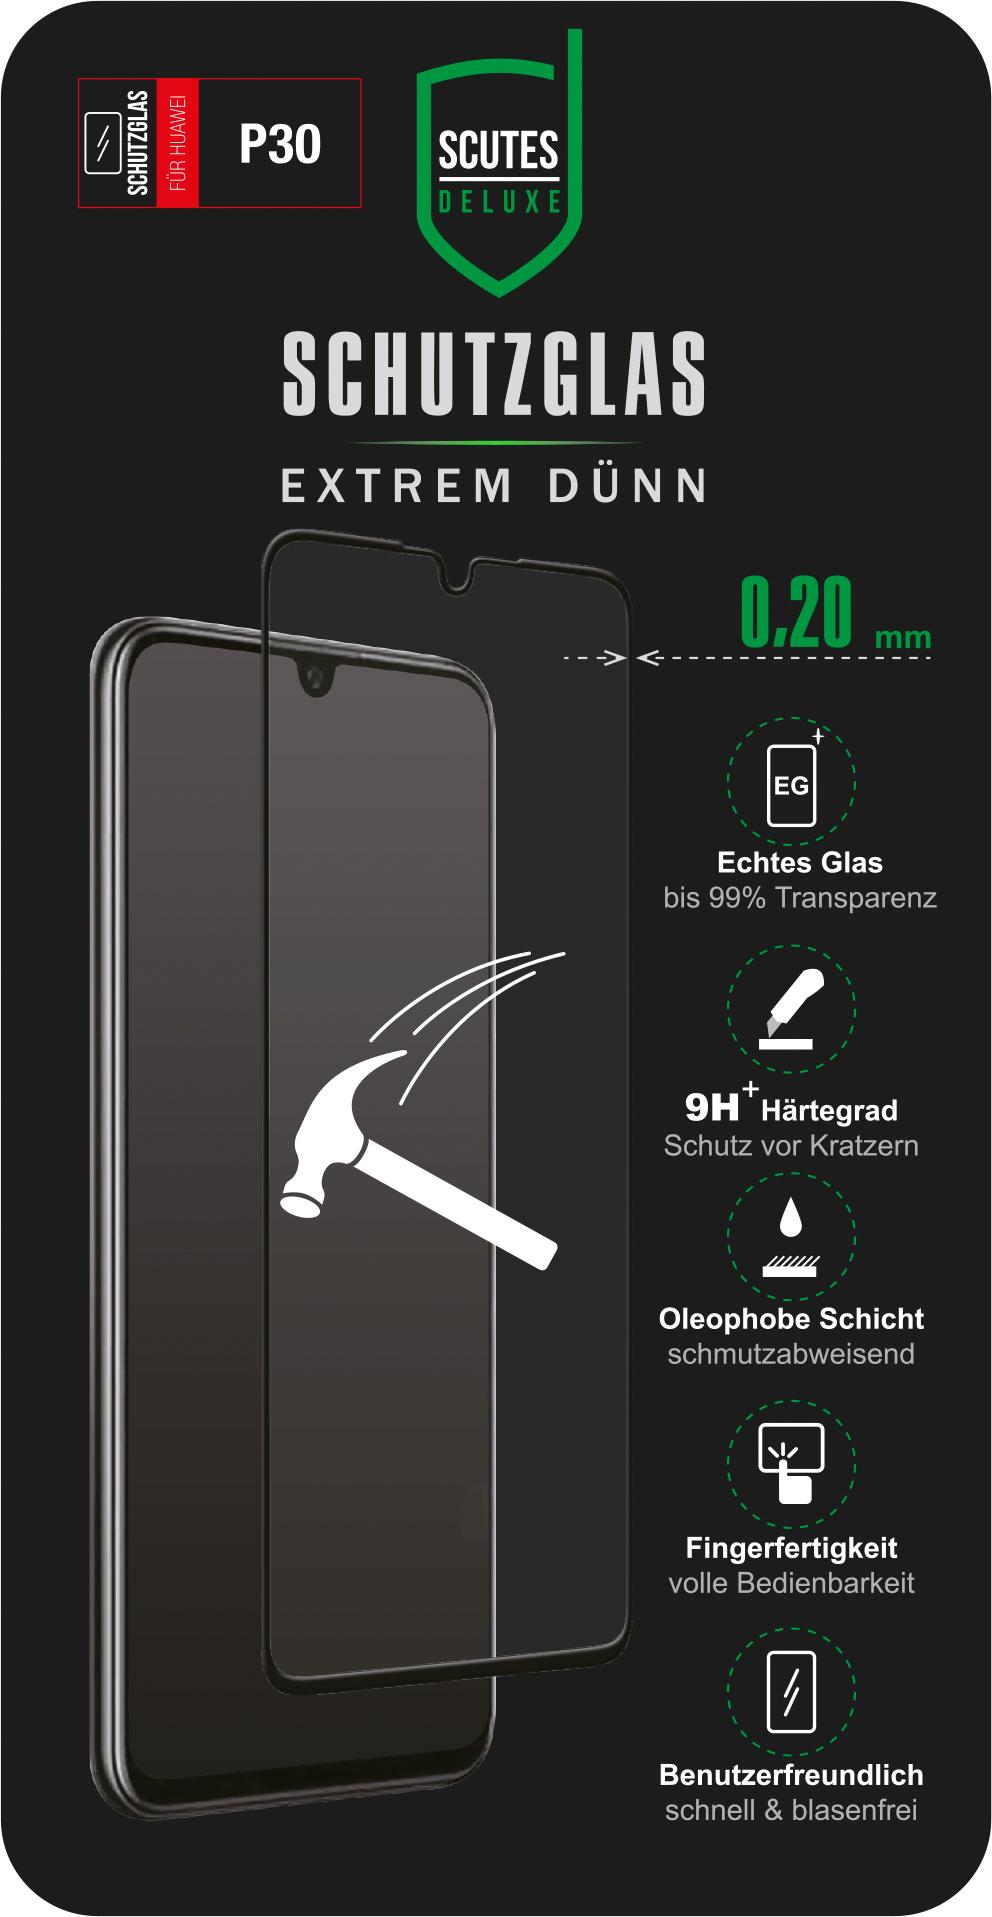 Schutzglas (Huawei P30)